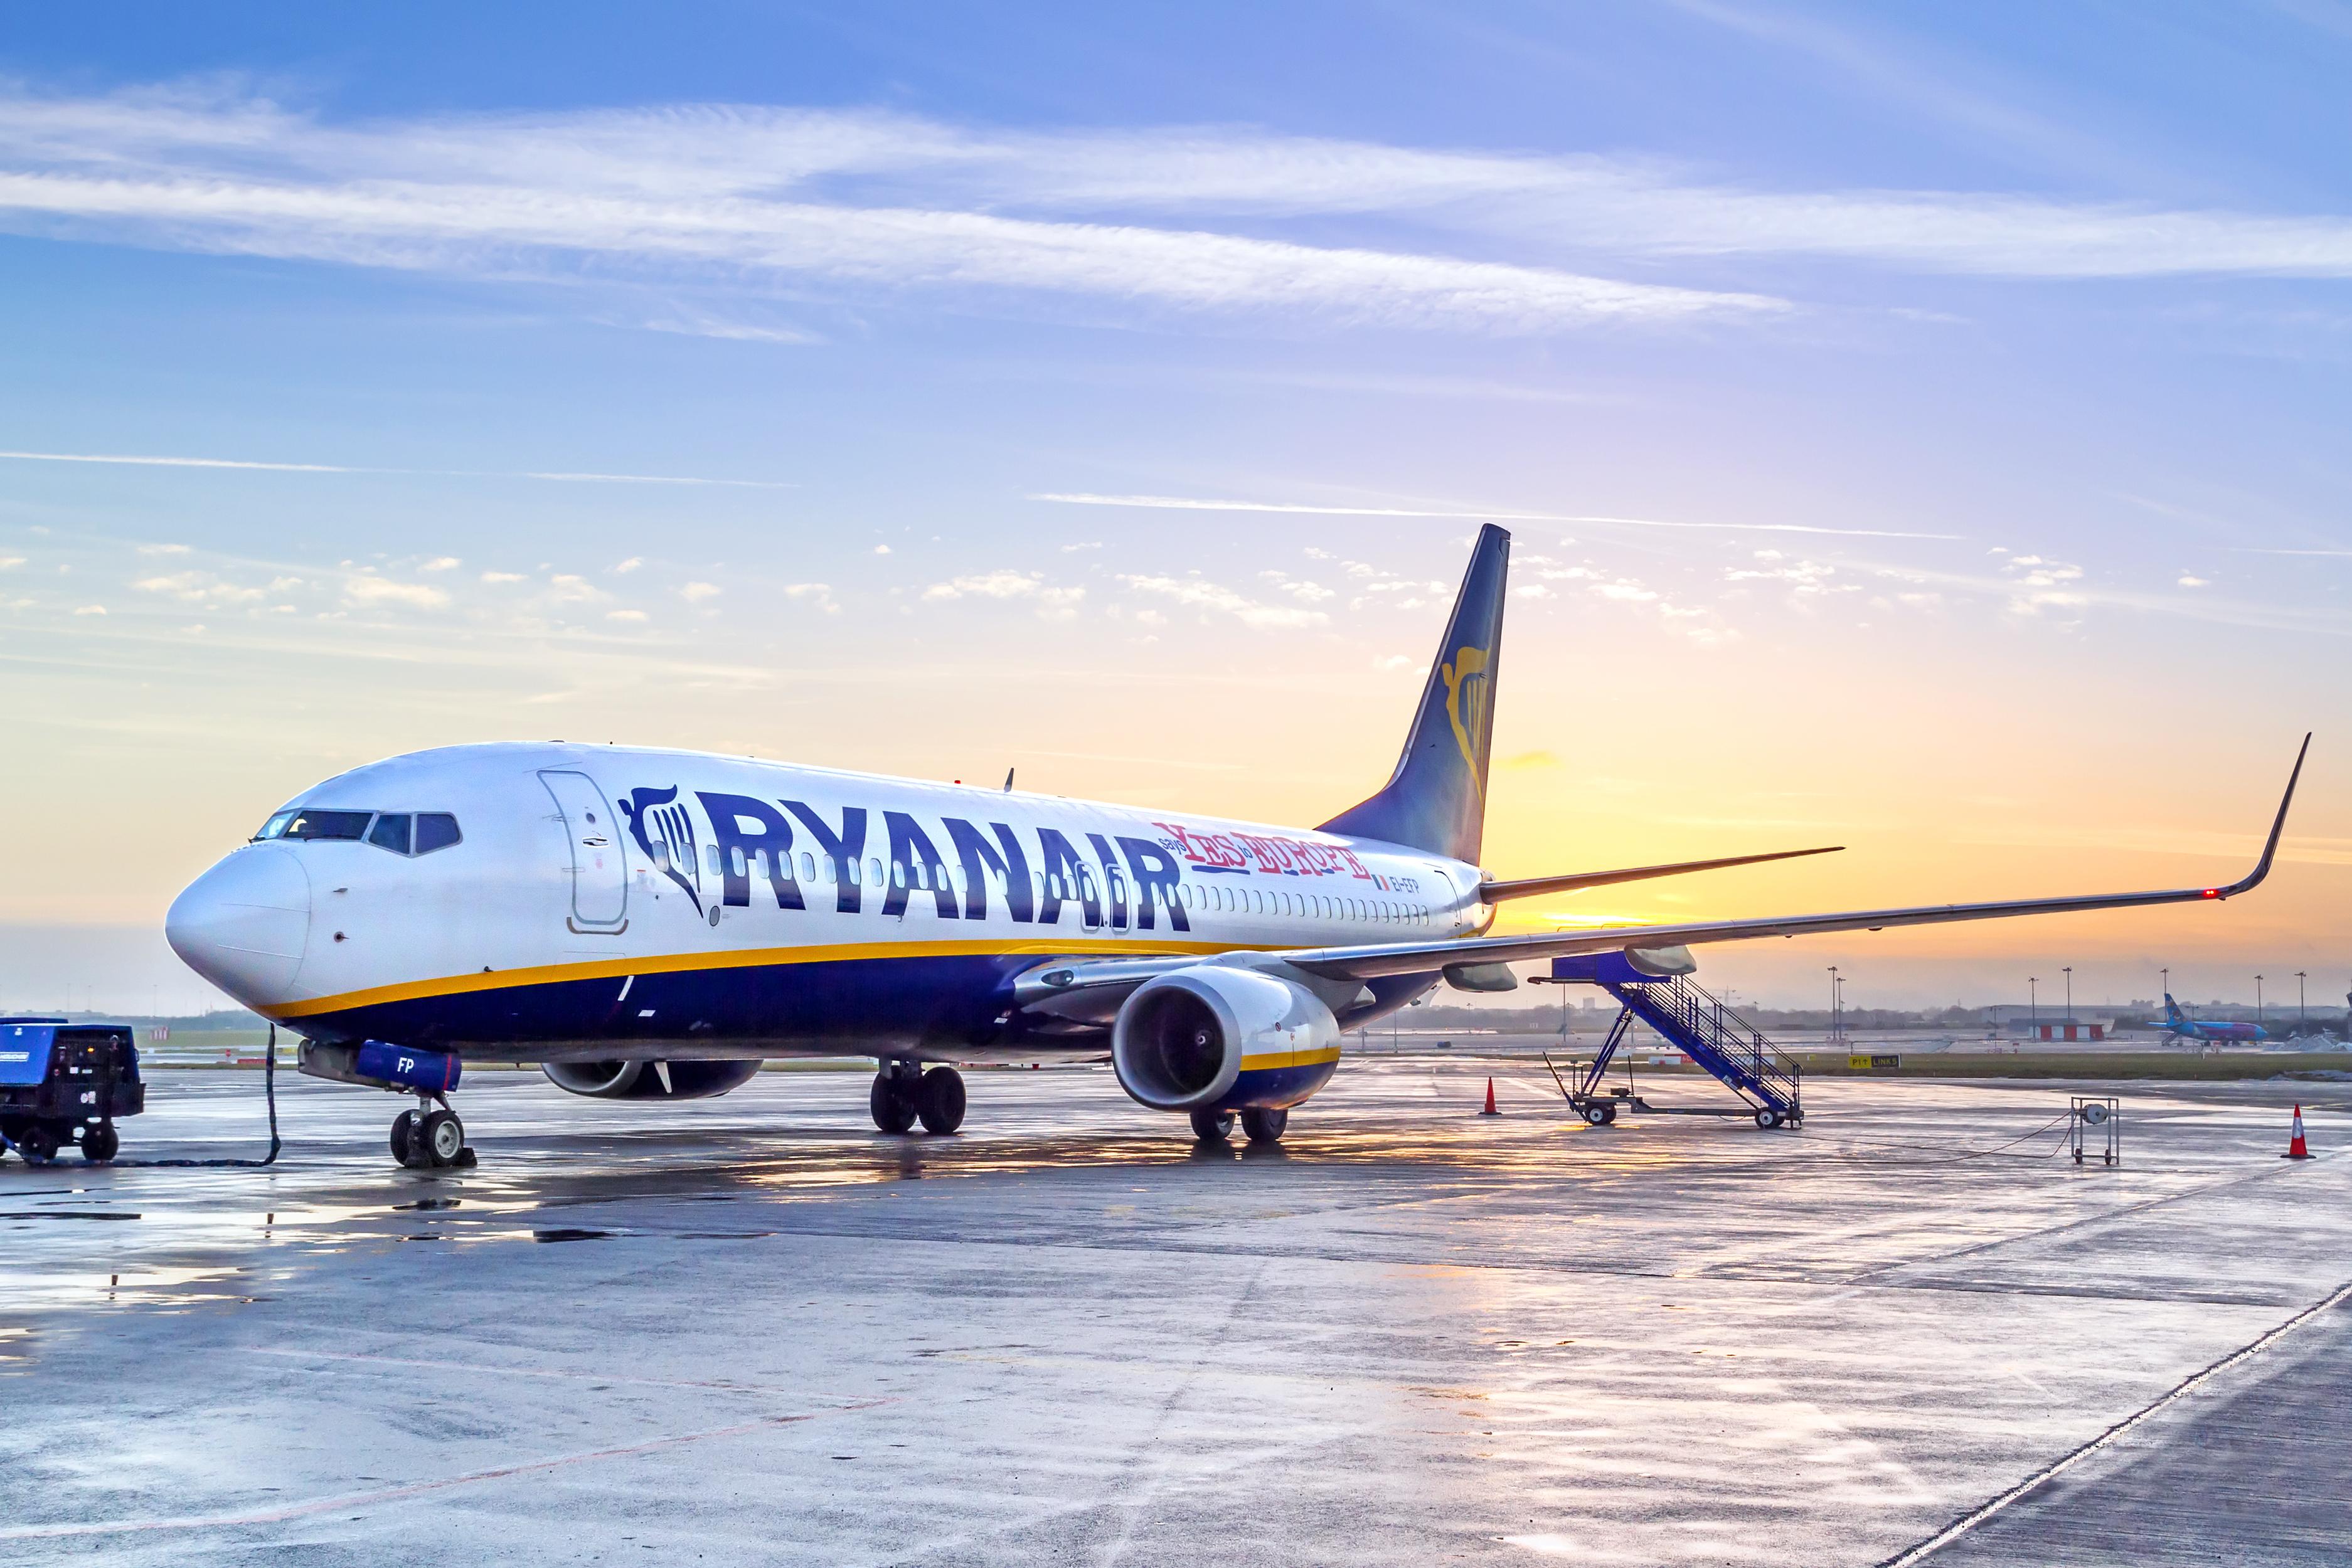 (Overzicht) RyanAir Retour-Overzicht + Hotels Vanaf €58 (Vlucht + Hotel)